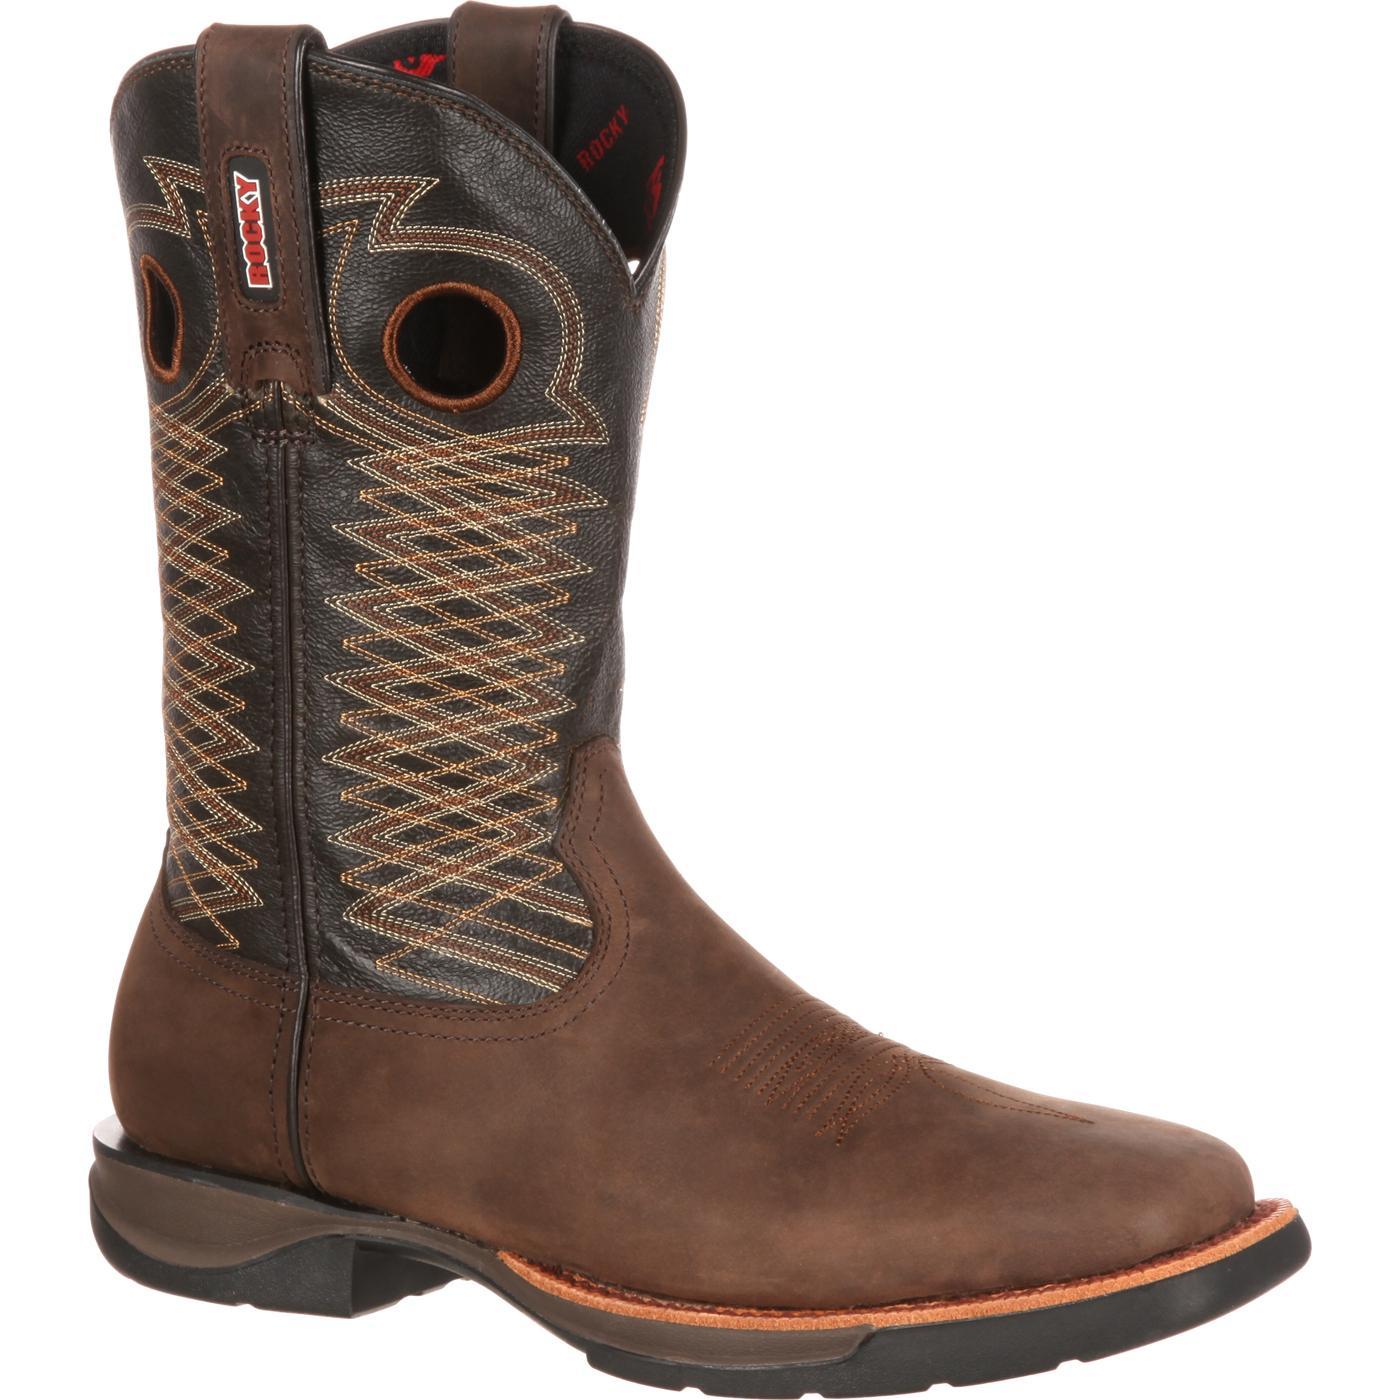 Rocky LT: Men's Lightweight Western Boot, style RKW0138